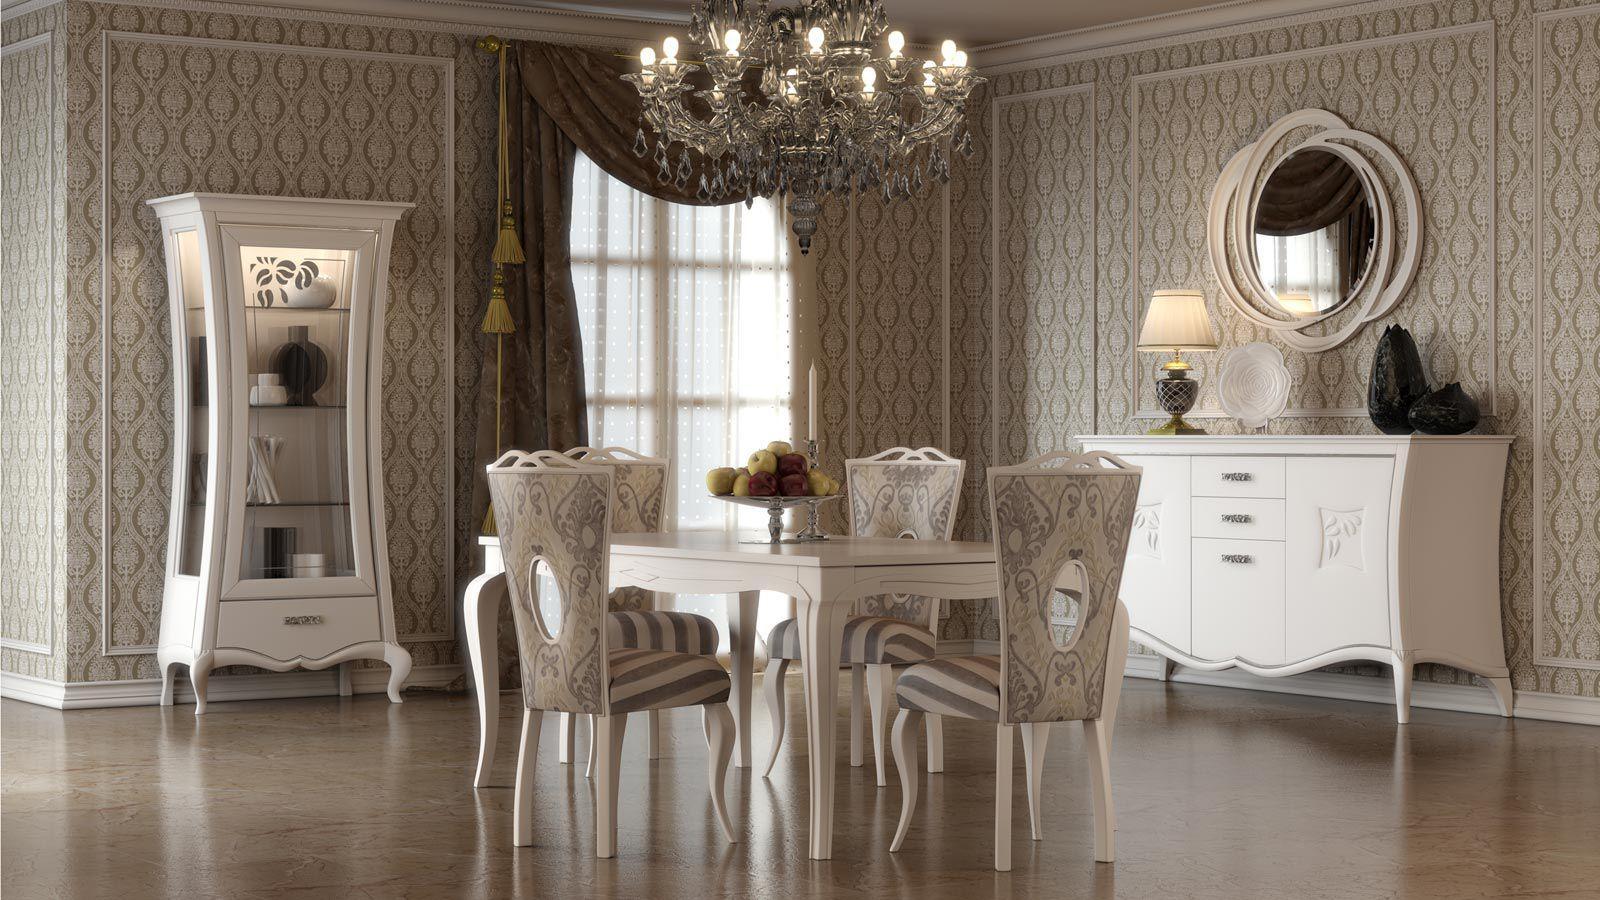 Sala da pranzo classica : sala da pranzo classica contemporanea ...